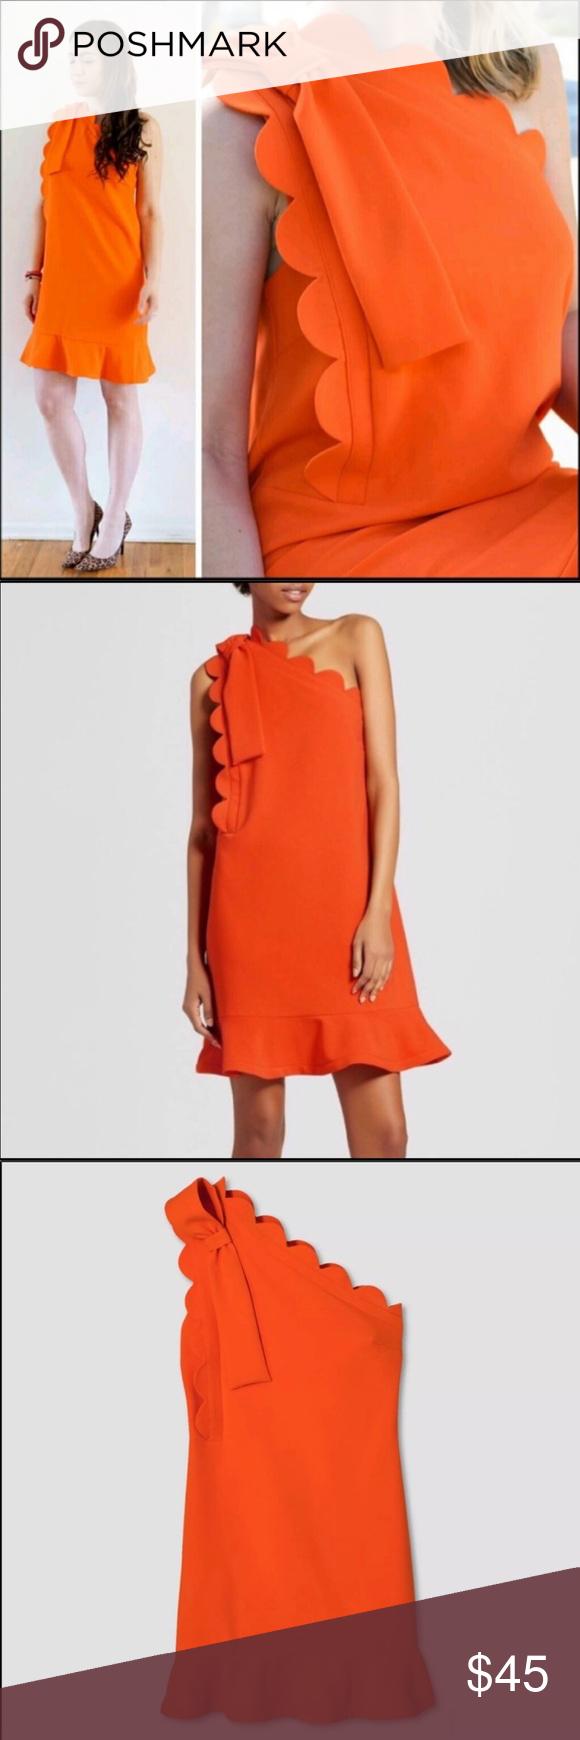 Hp Nwt Victoria Beckham X Target Orange Dress Victoria Beckham Target Victoria Beckham Orange Dress [ 1740 x 580 Pixel ]